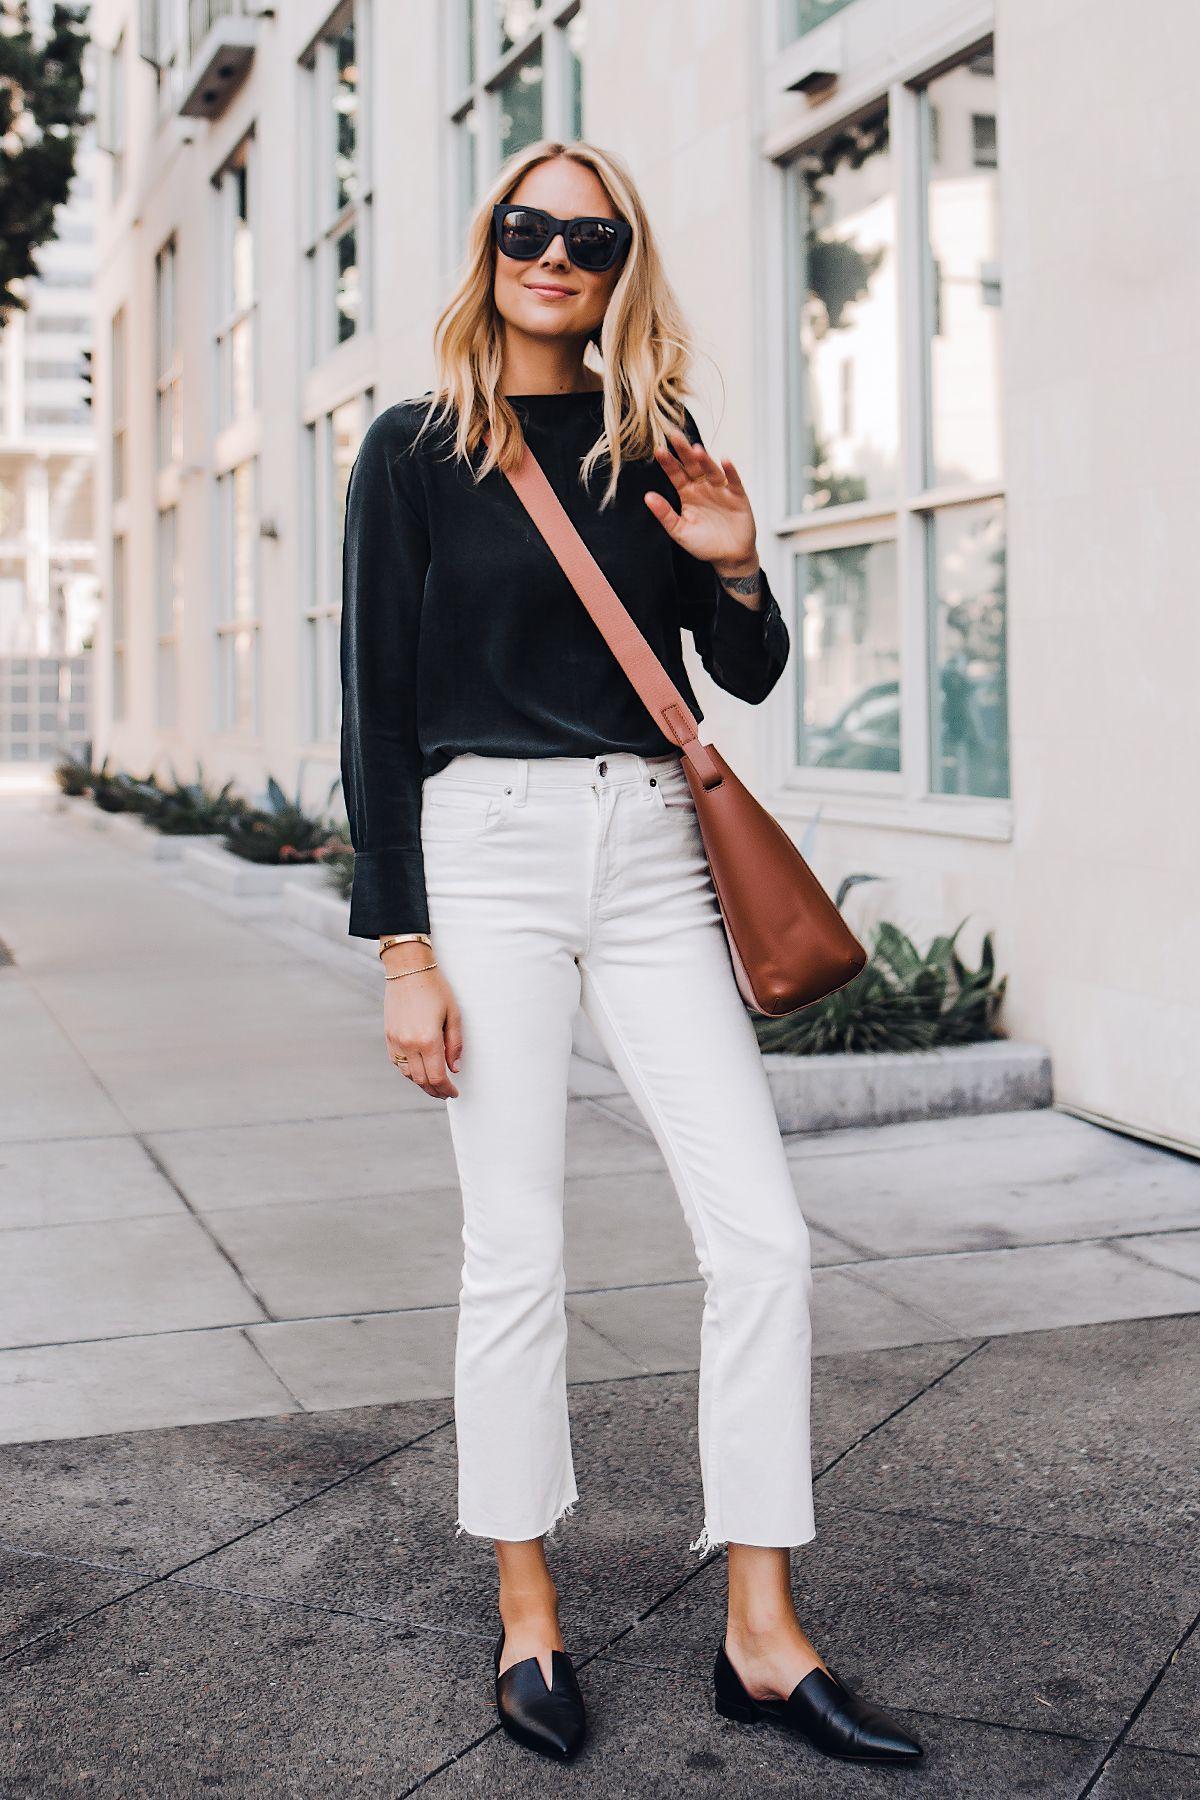 How to Style White Jeans 3 Ways | Meganlarussa #